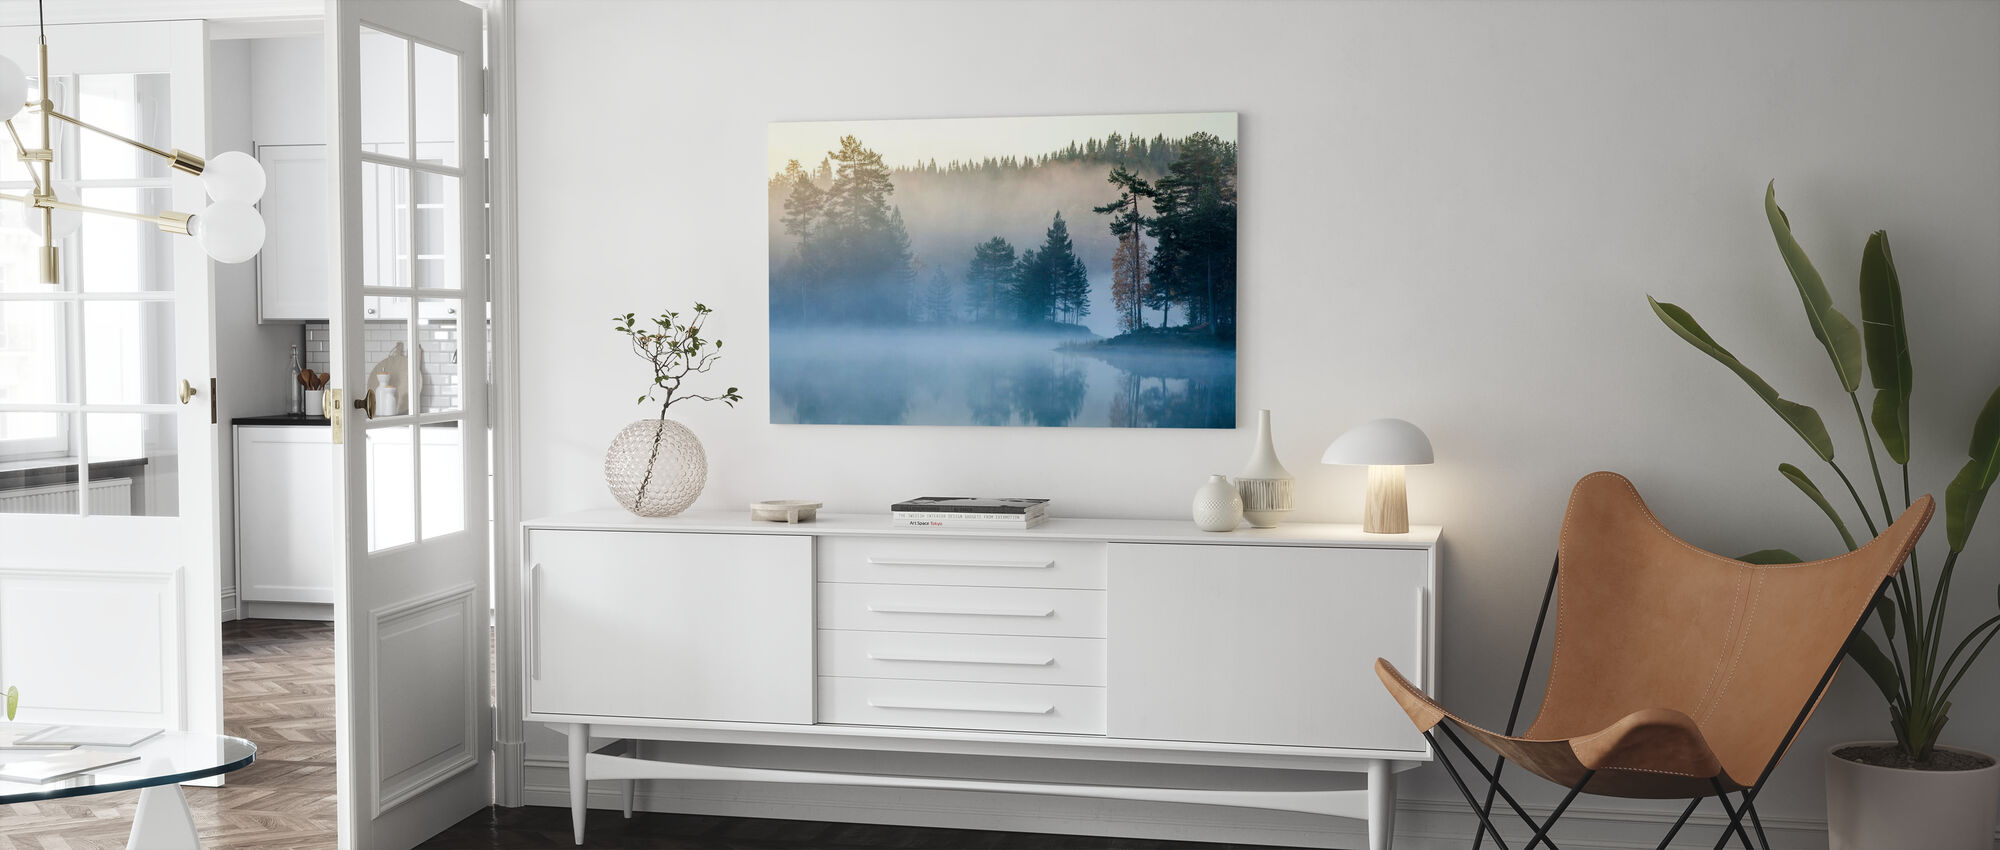 Norsk Mist - Canvastavla - Vardagsrum